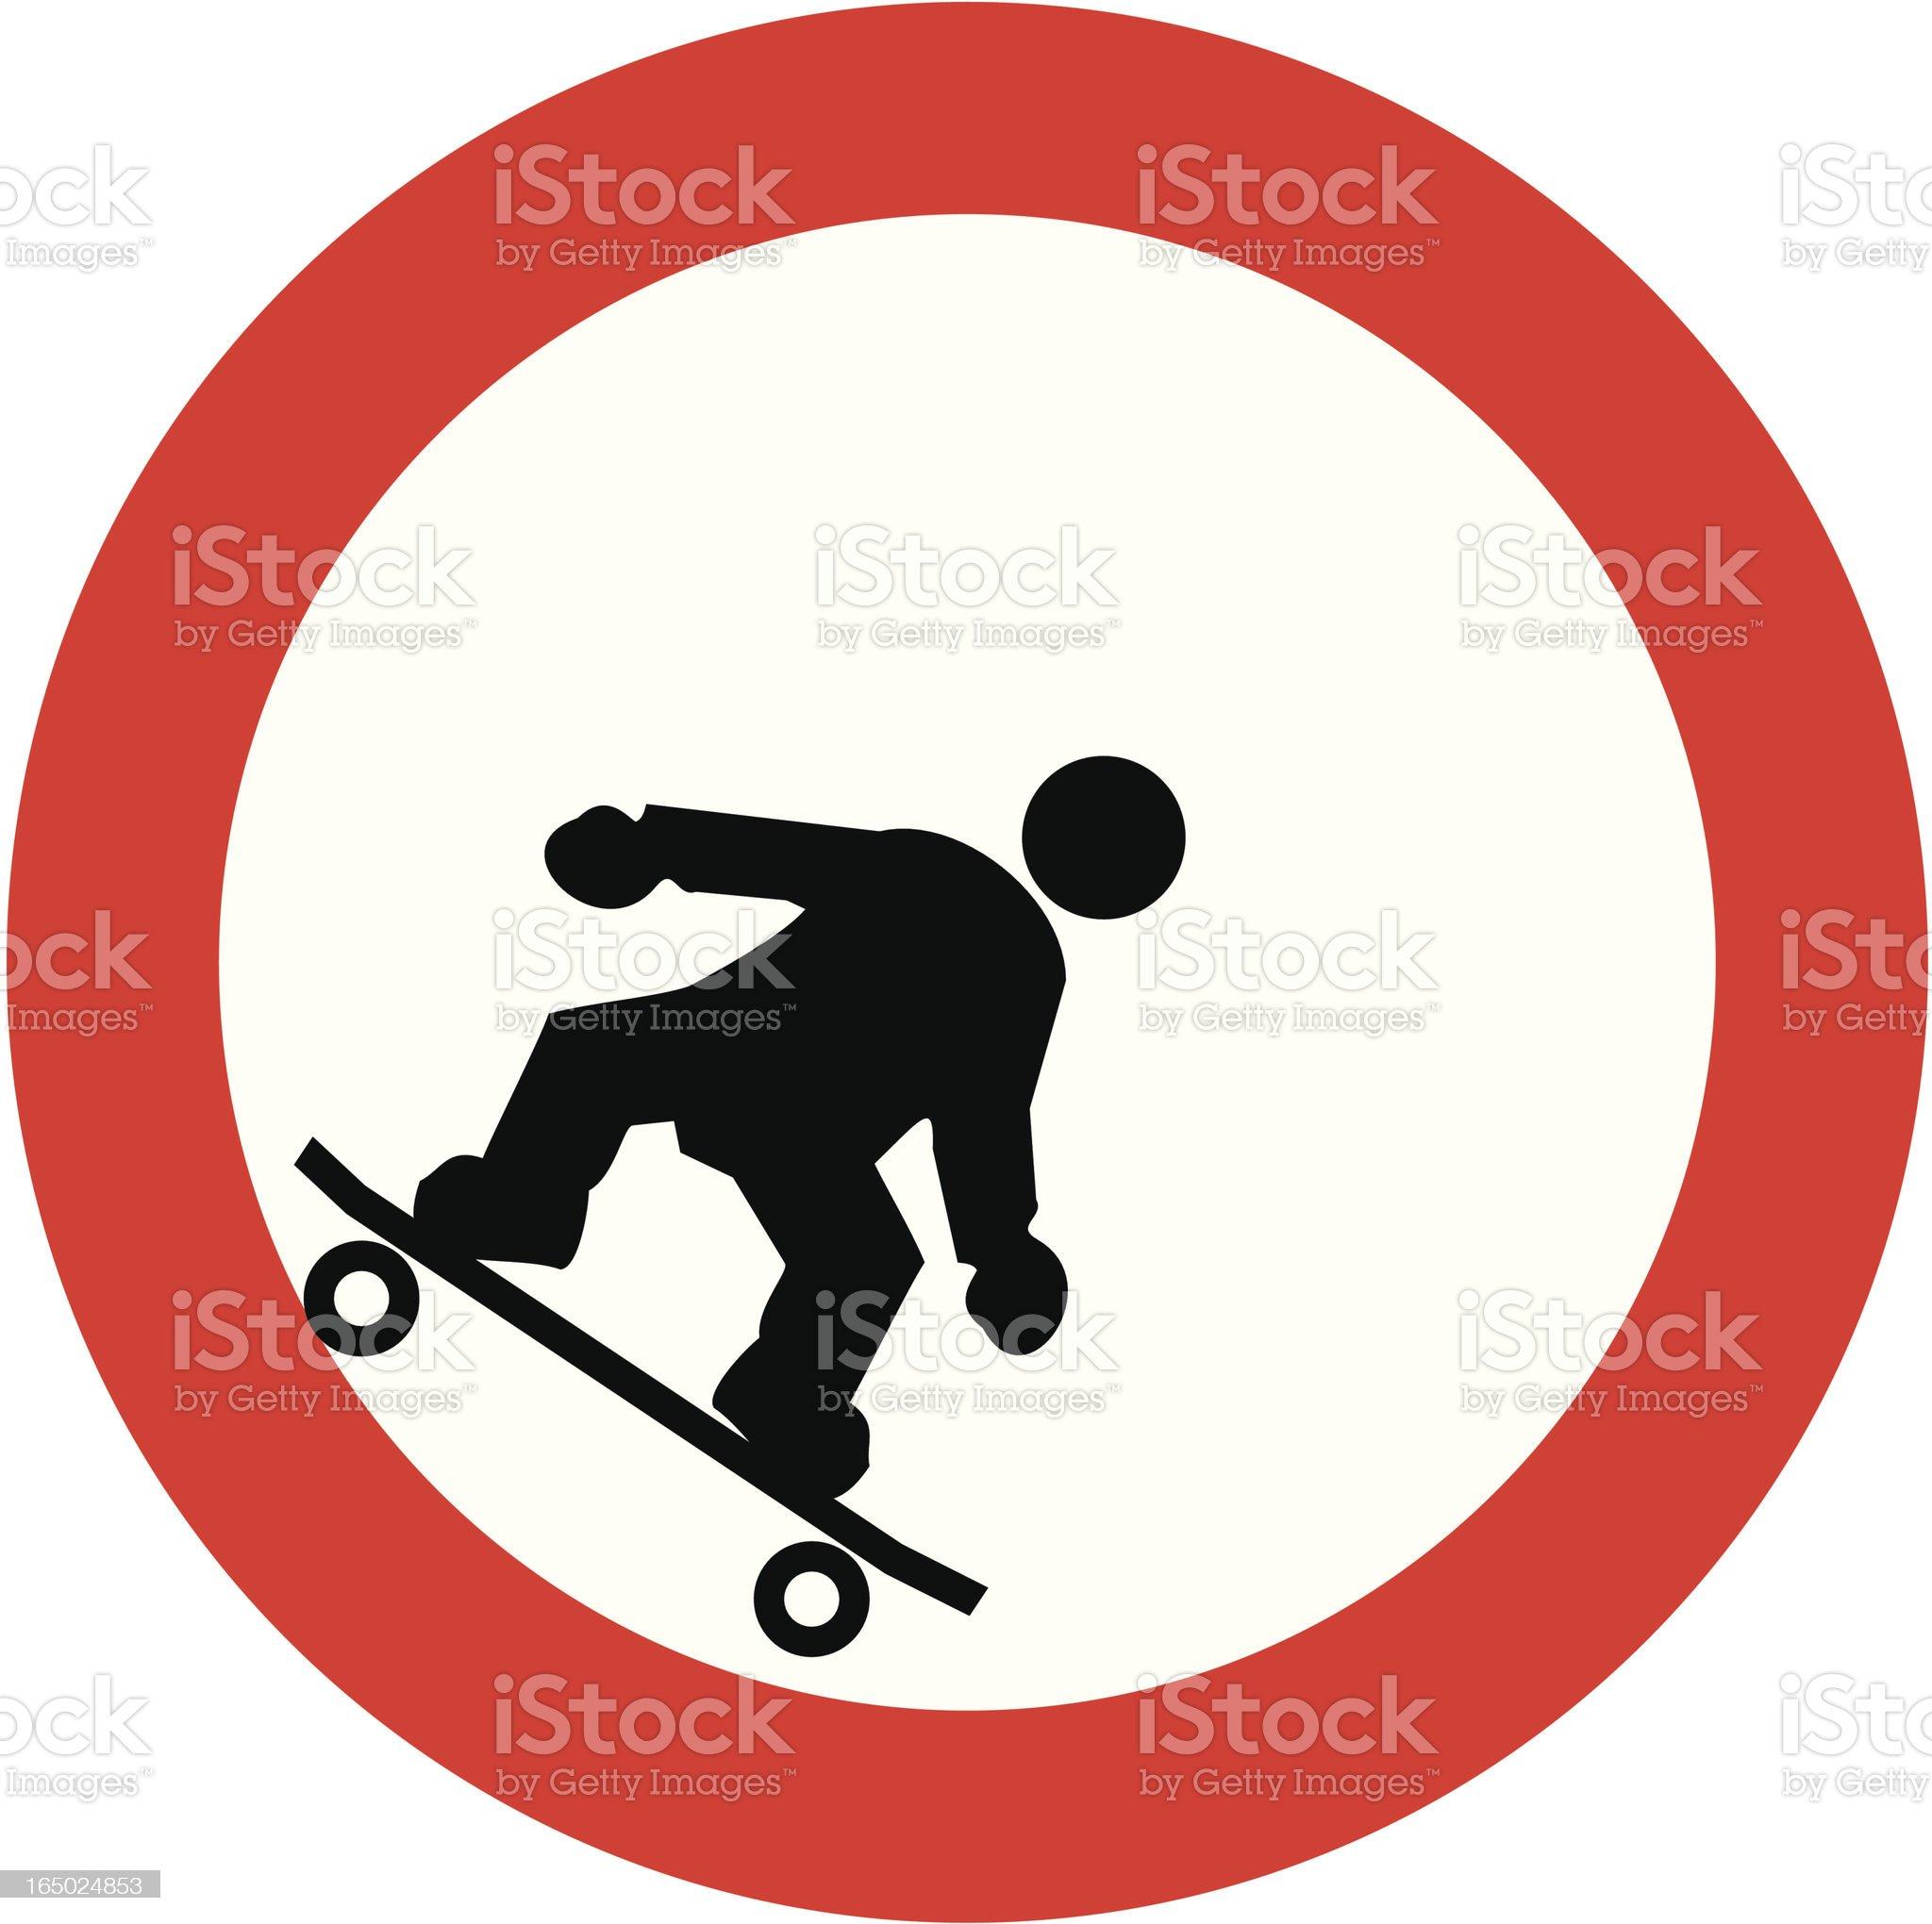 tube skating street sign royalty-free stock vector art